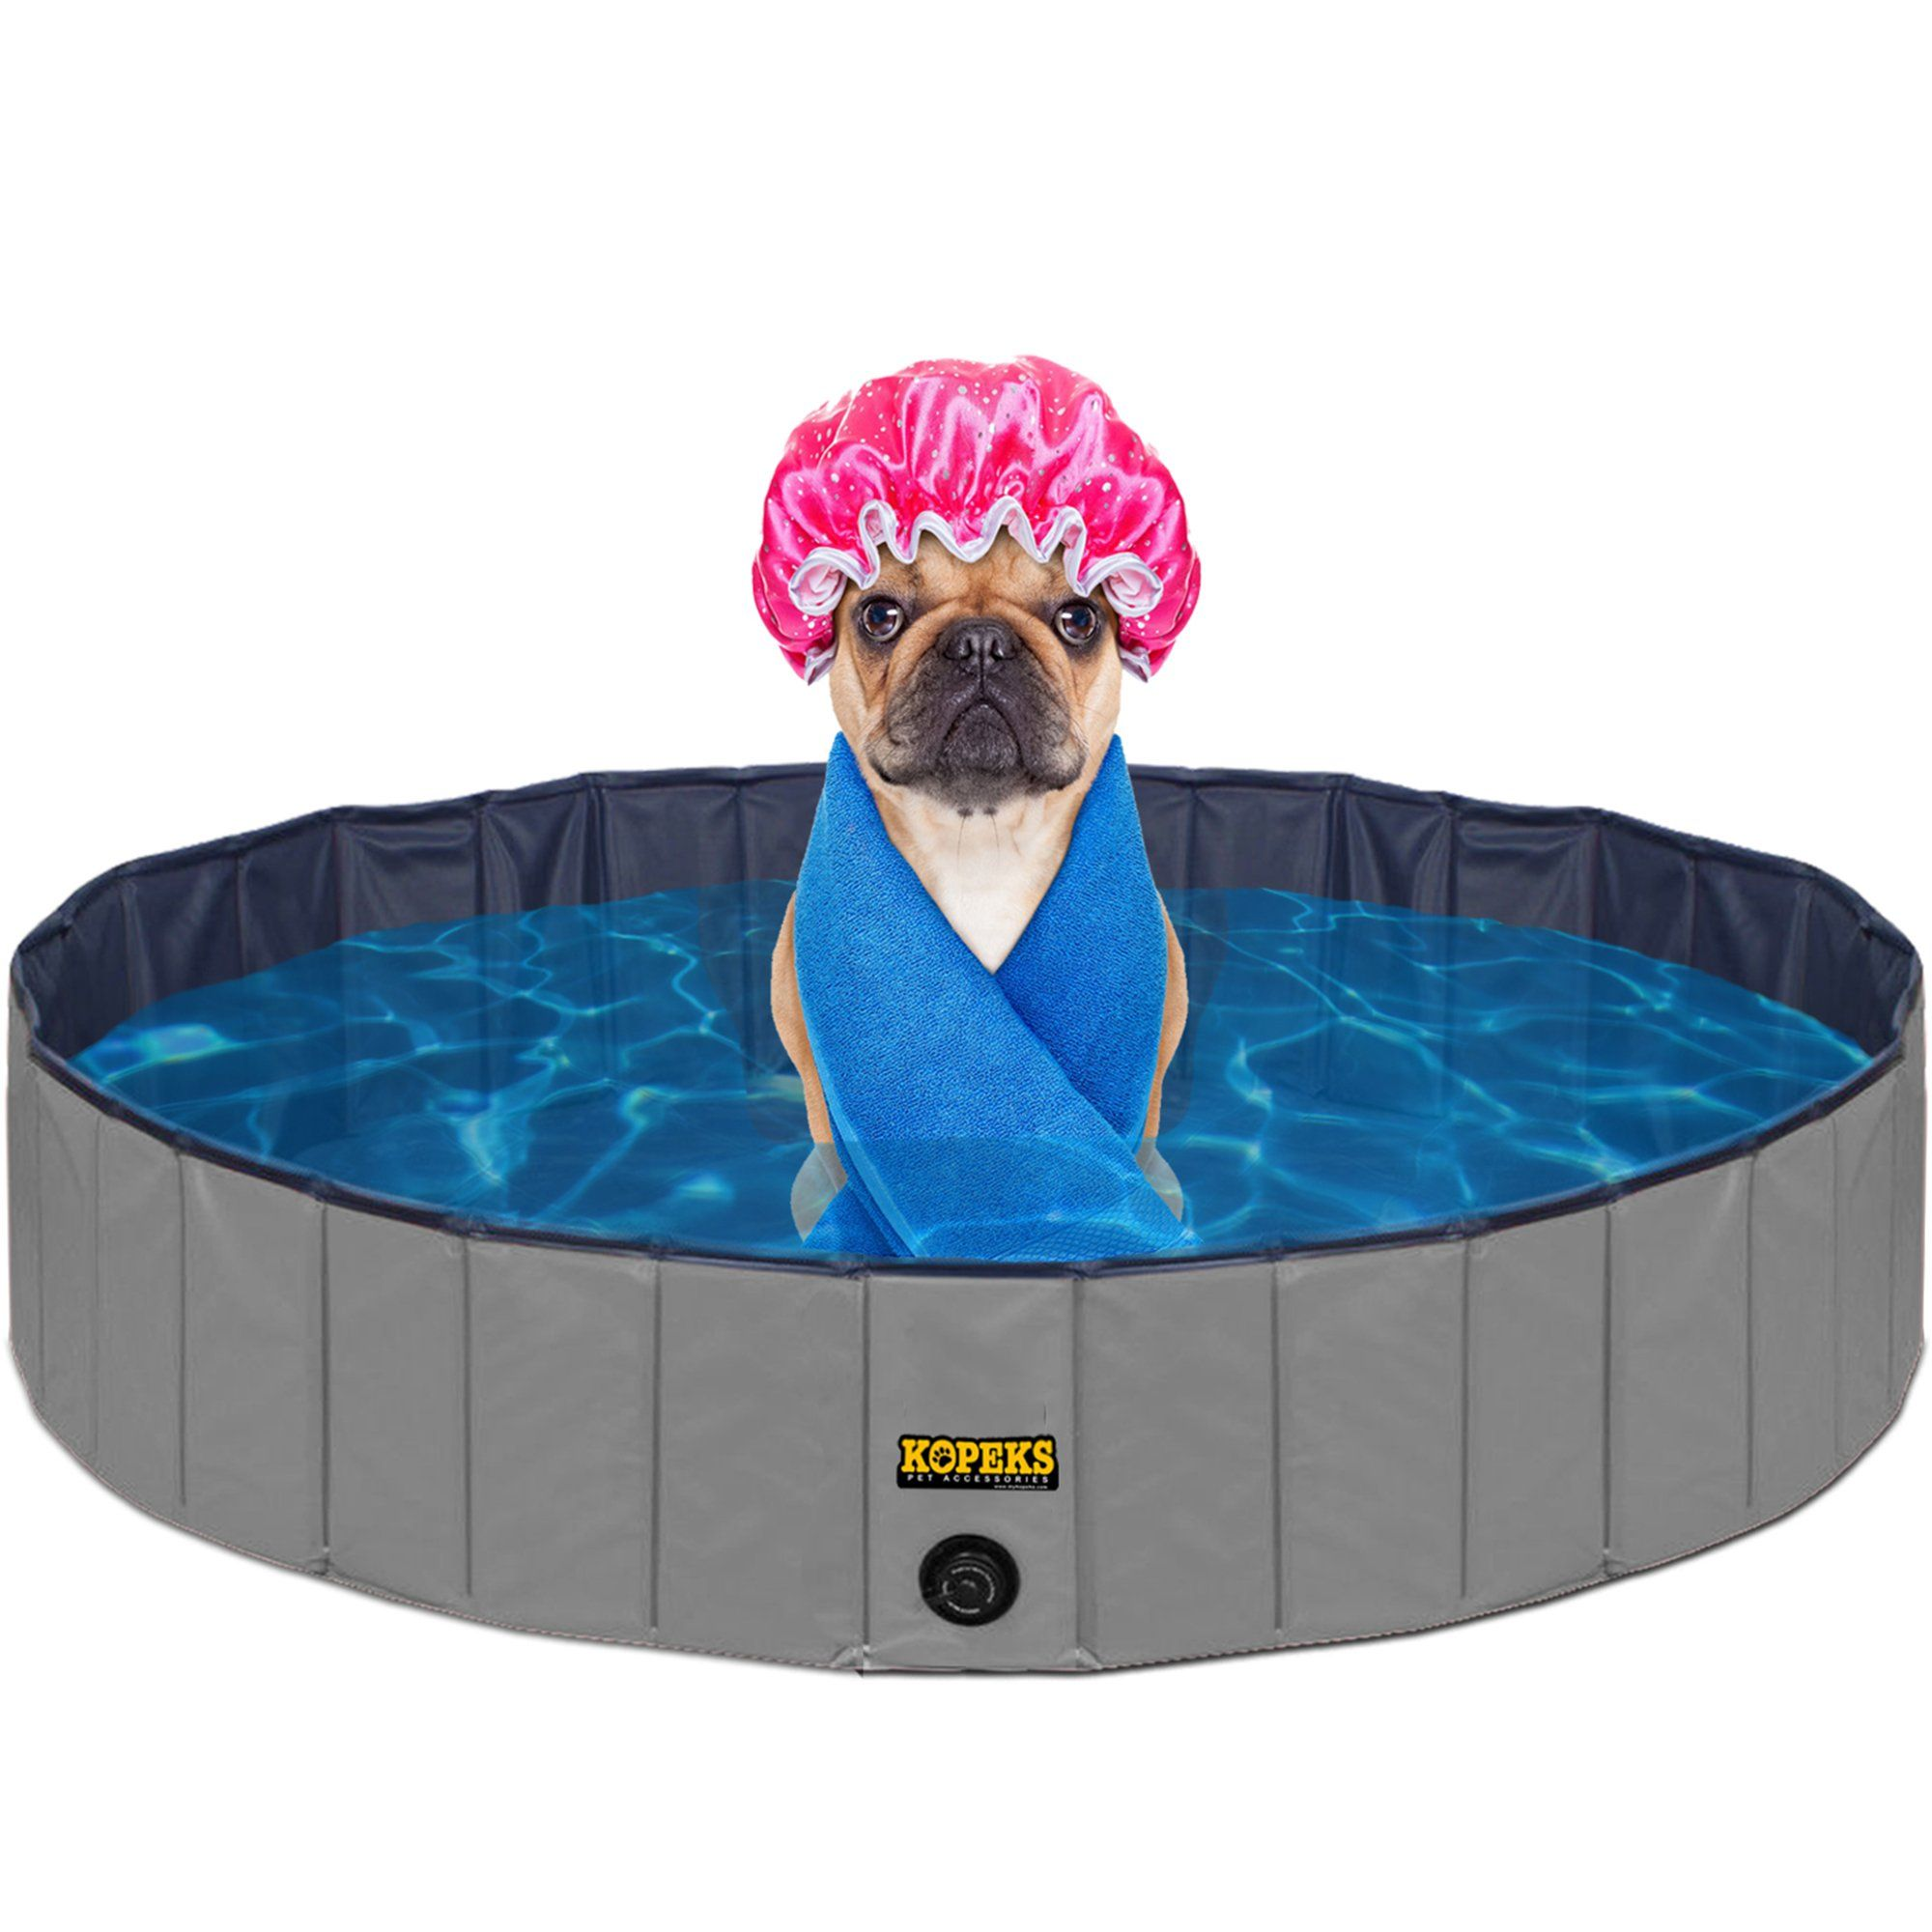 Kopeks Foldable Grey Grooming Bathing Pool Tub For Dogs Large